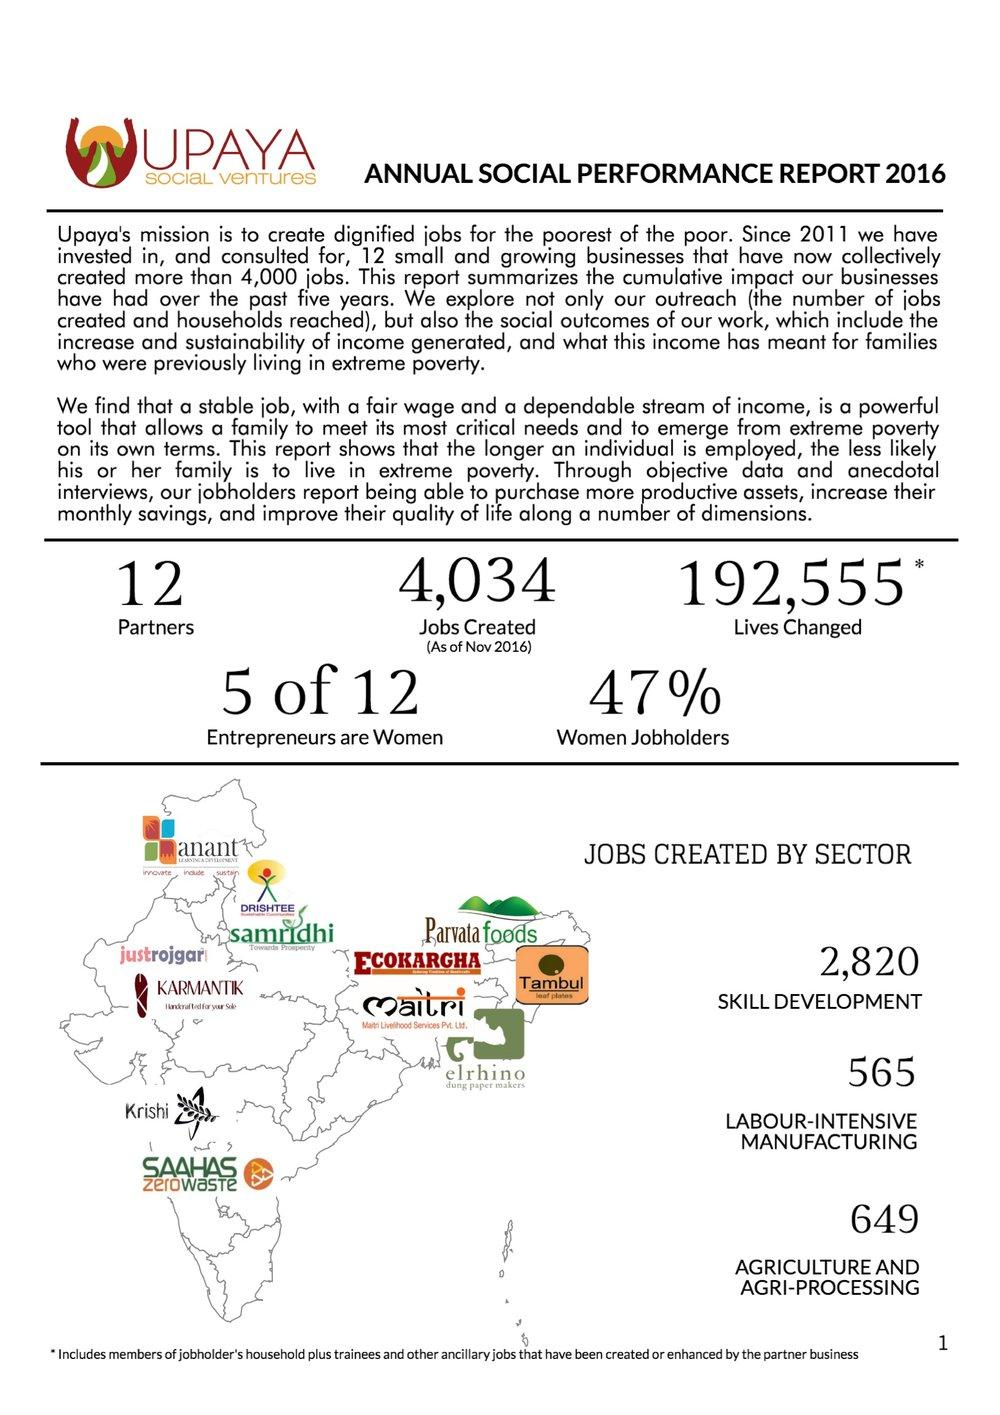 2011-2016 Social Performance Report